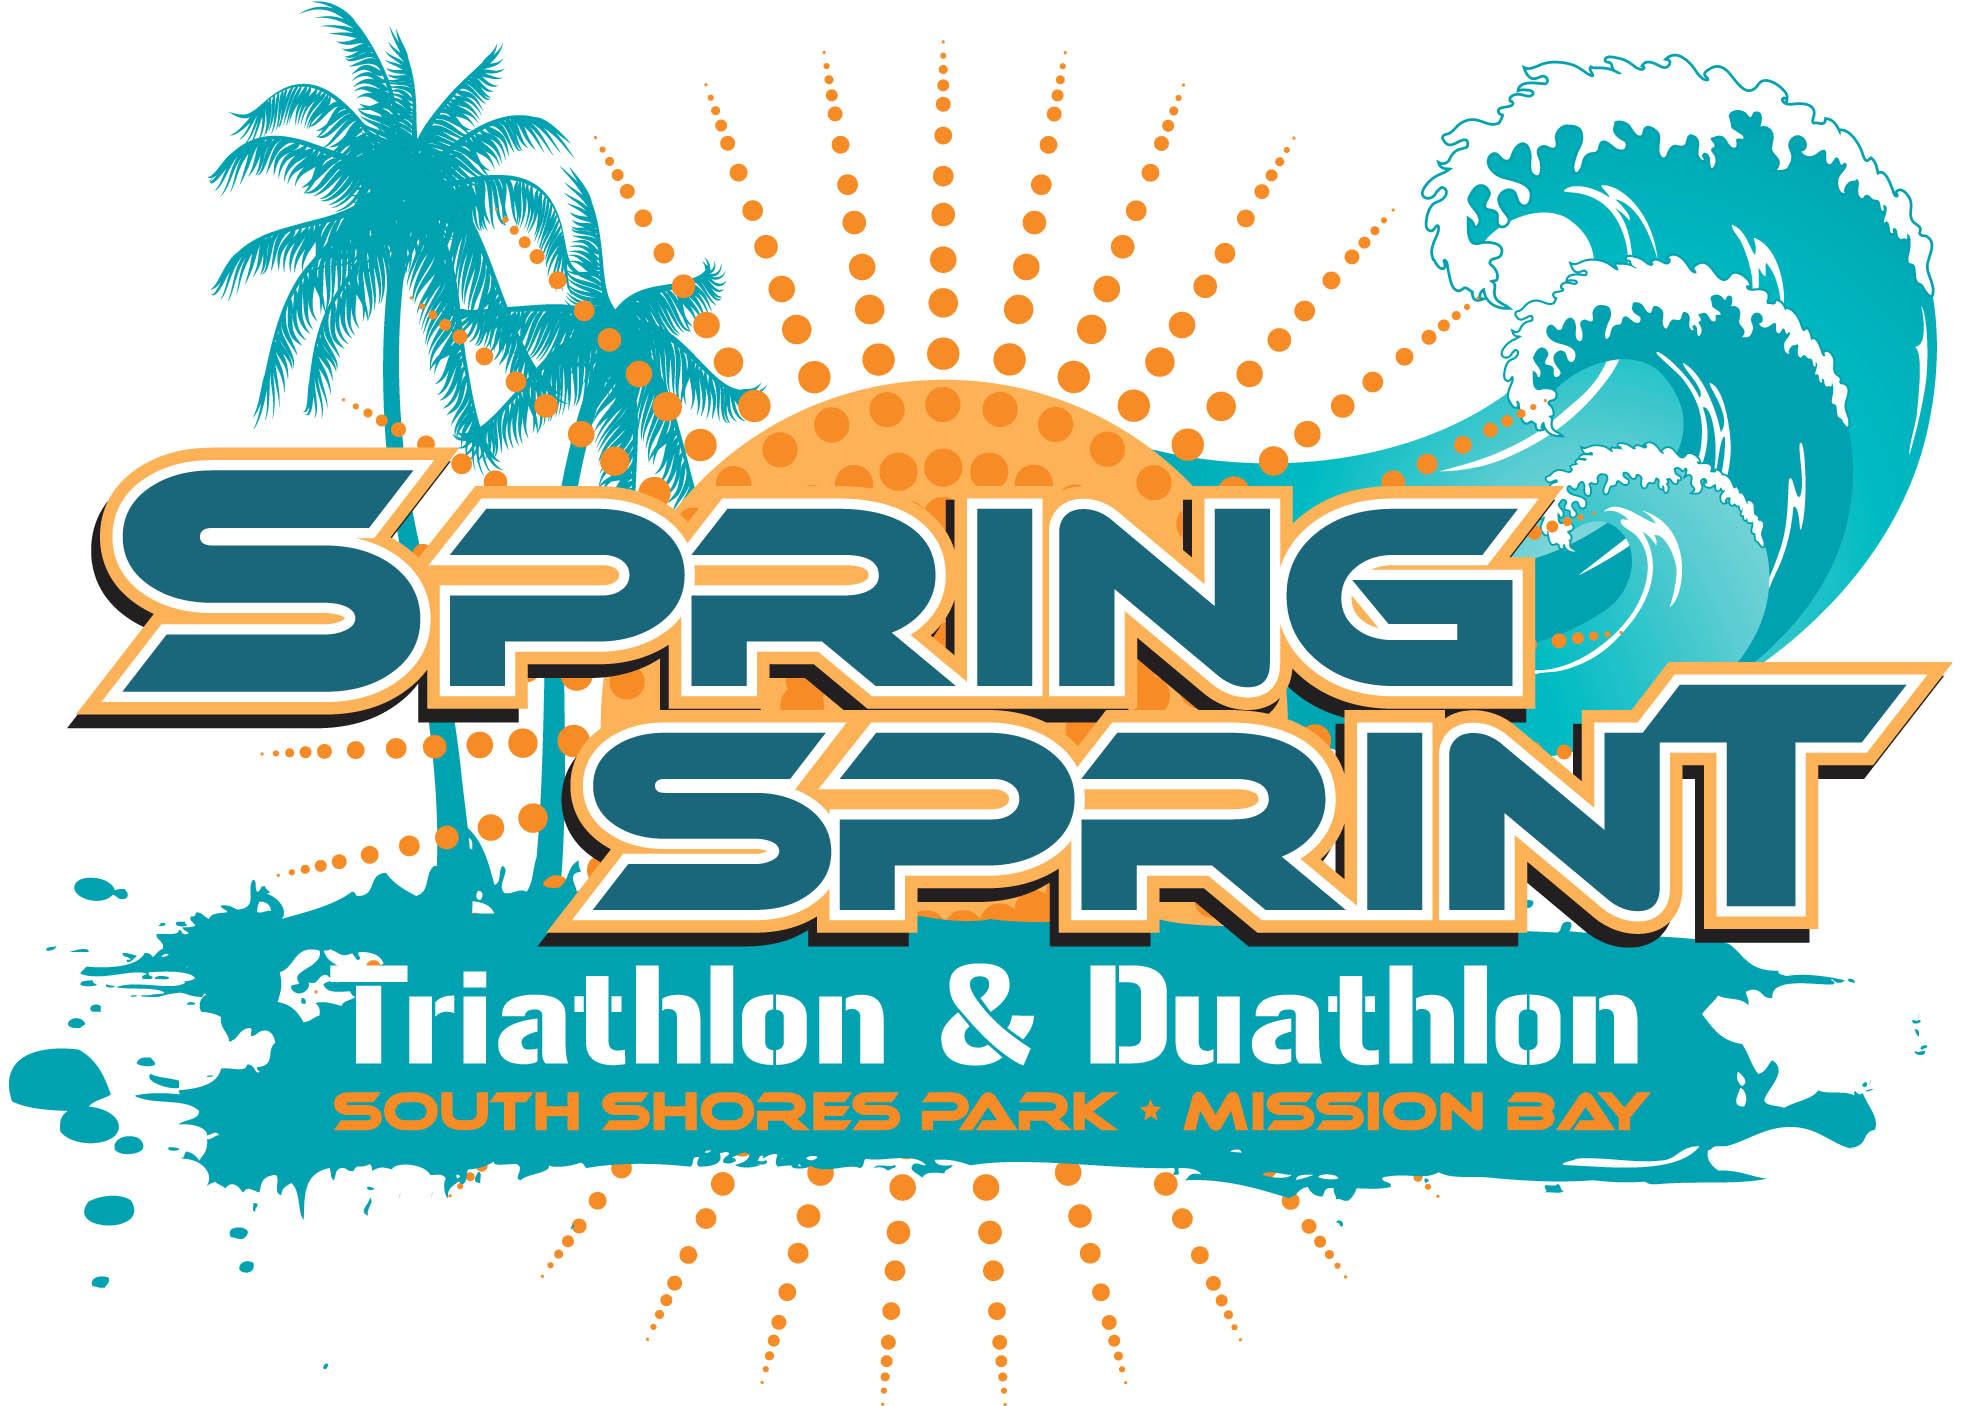 Spring Sprint no year